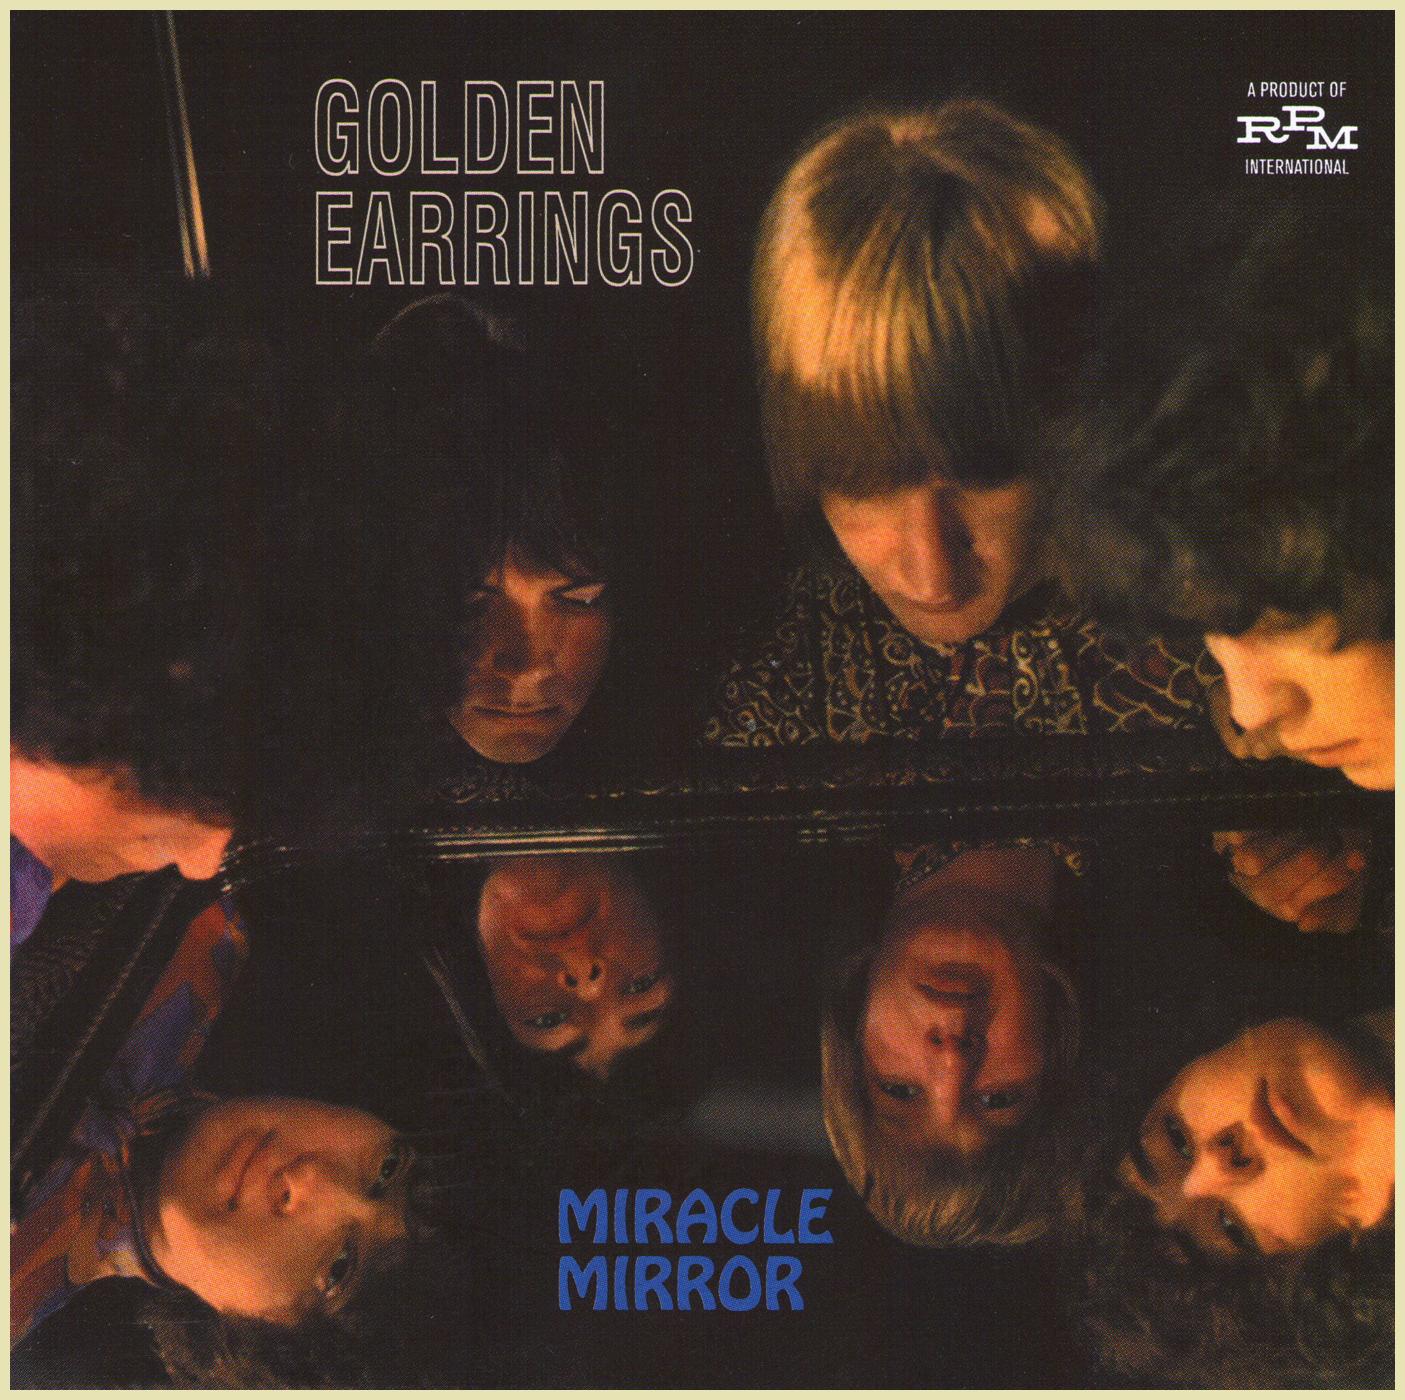 The Golden Earrings  Miracle Mirror (196768 Dutch, Magnificent Mod Beat  Rock, 2009 Rpm Bonus Tracks Edition)